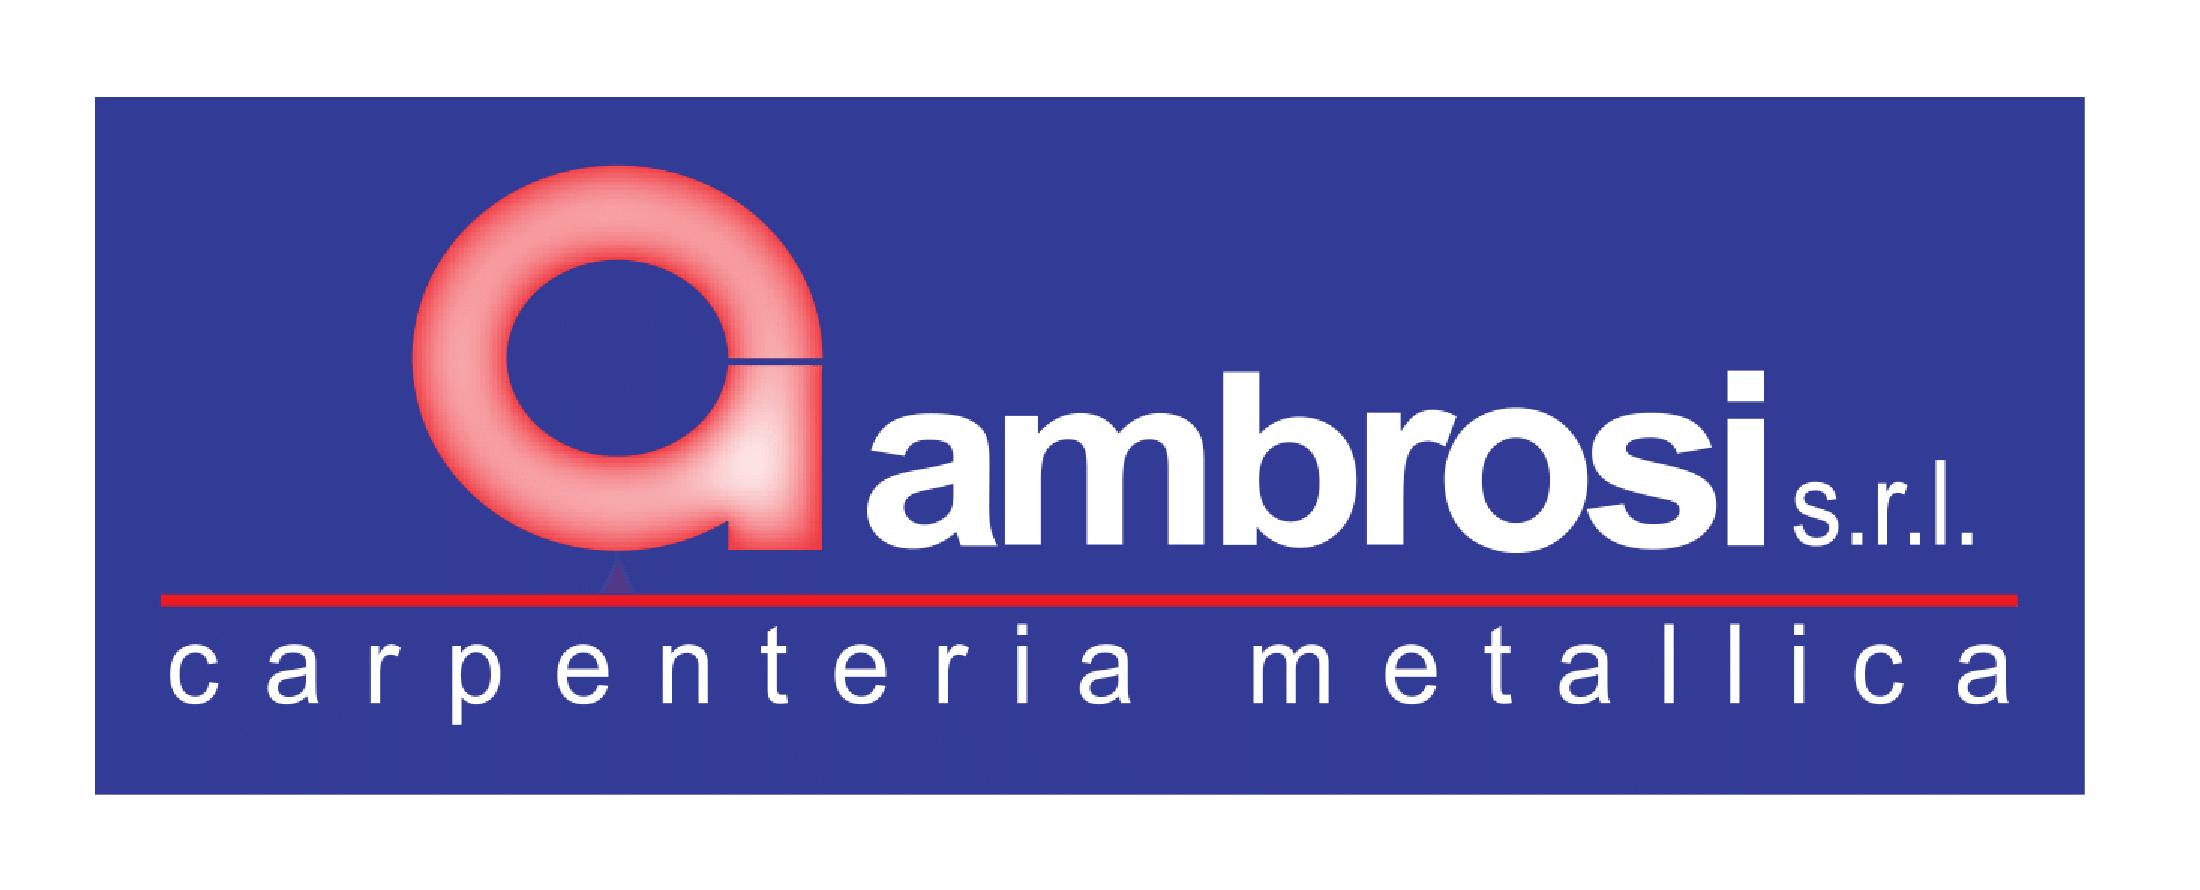 Ambrosi s.r.l.